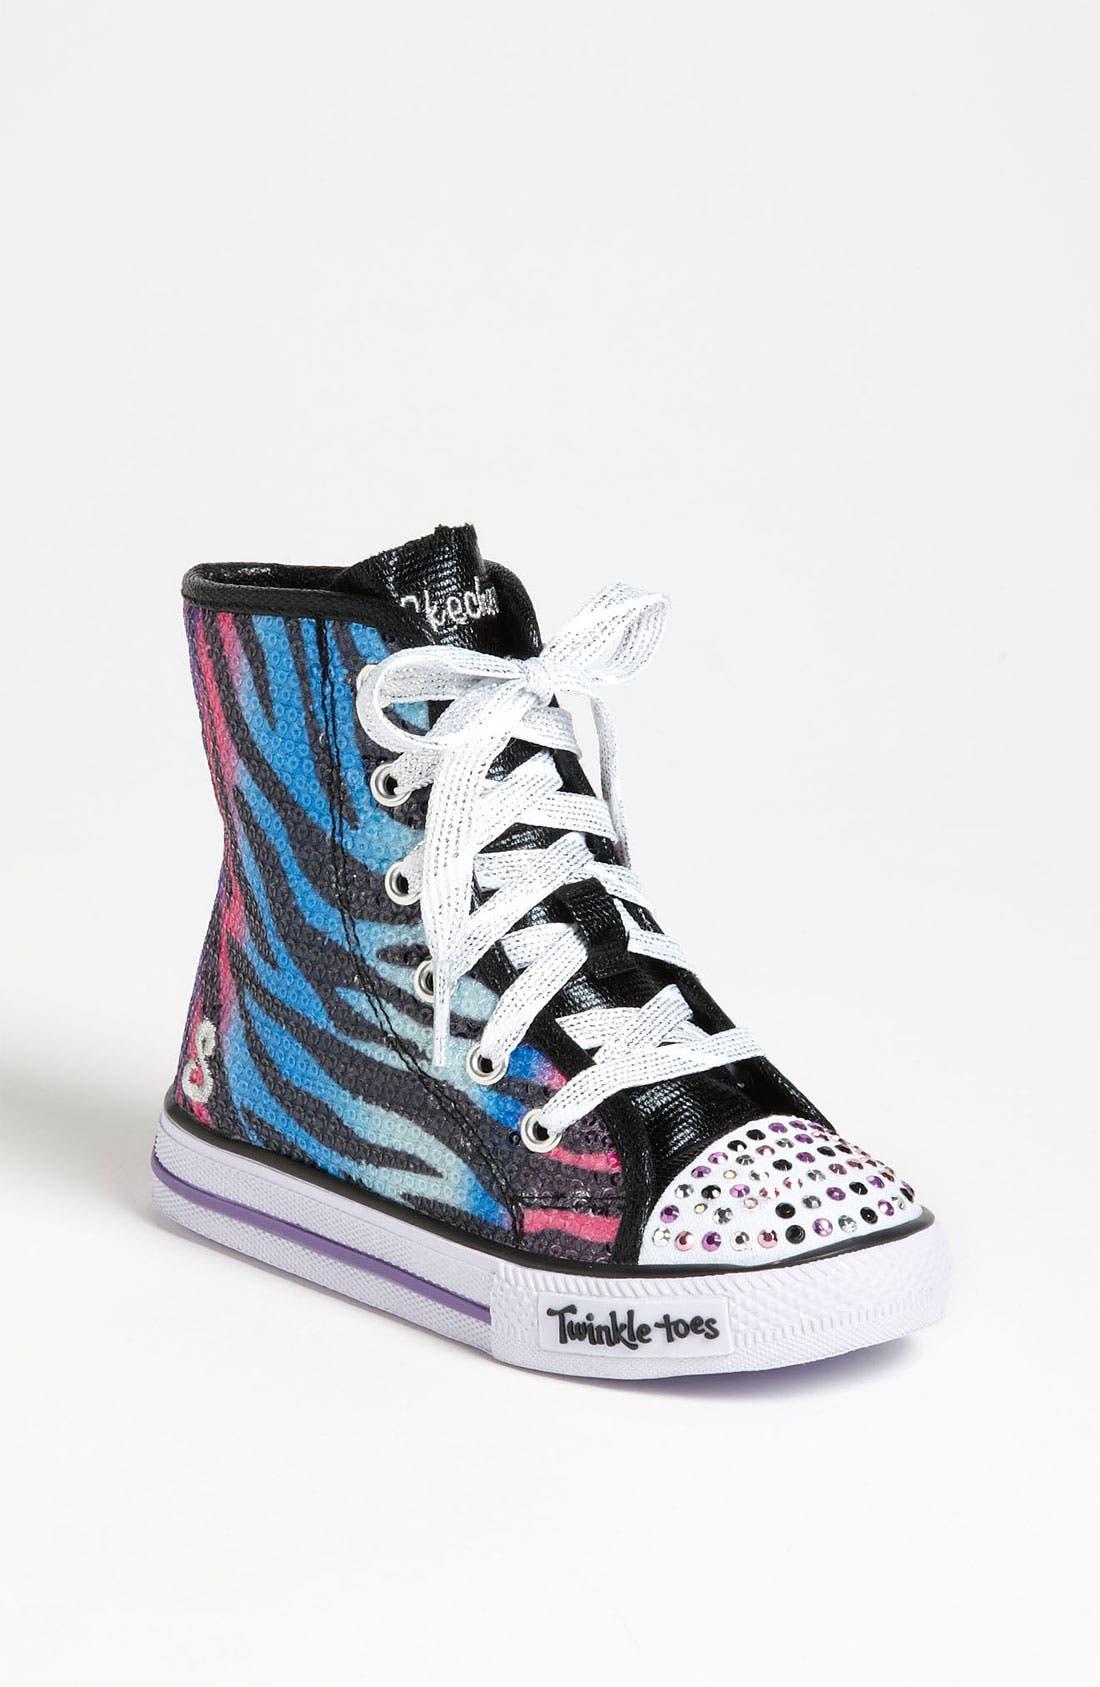 Alternate Image 1 Selected - SKECHERS 'Shuffles - Notorious' Light Up Sneaker (Walker & Toddler)